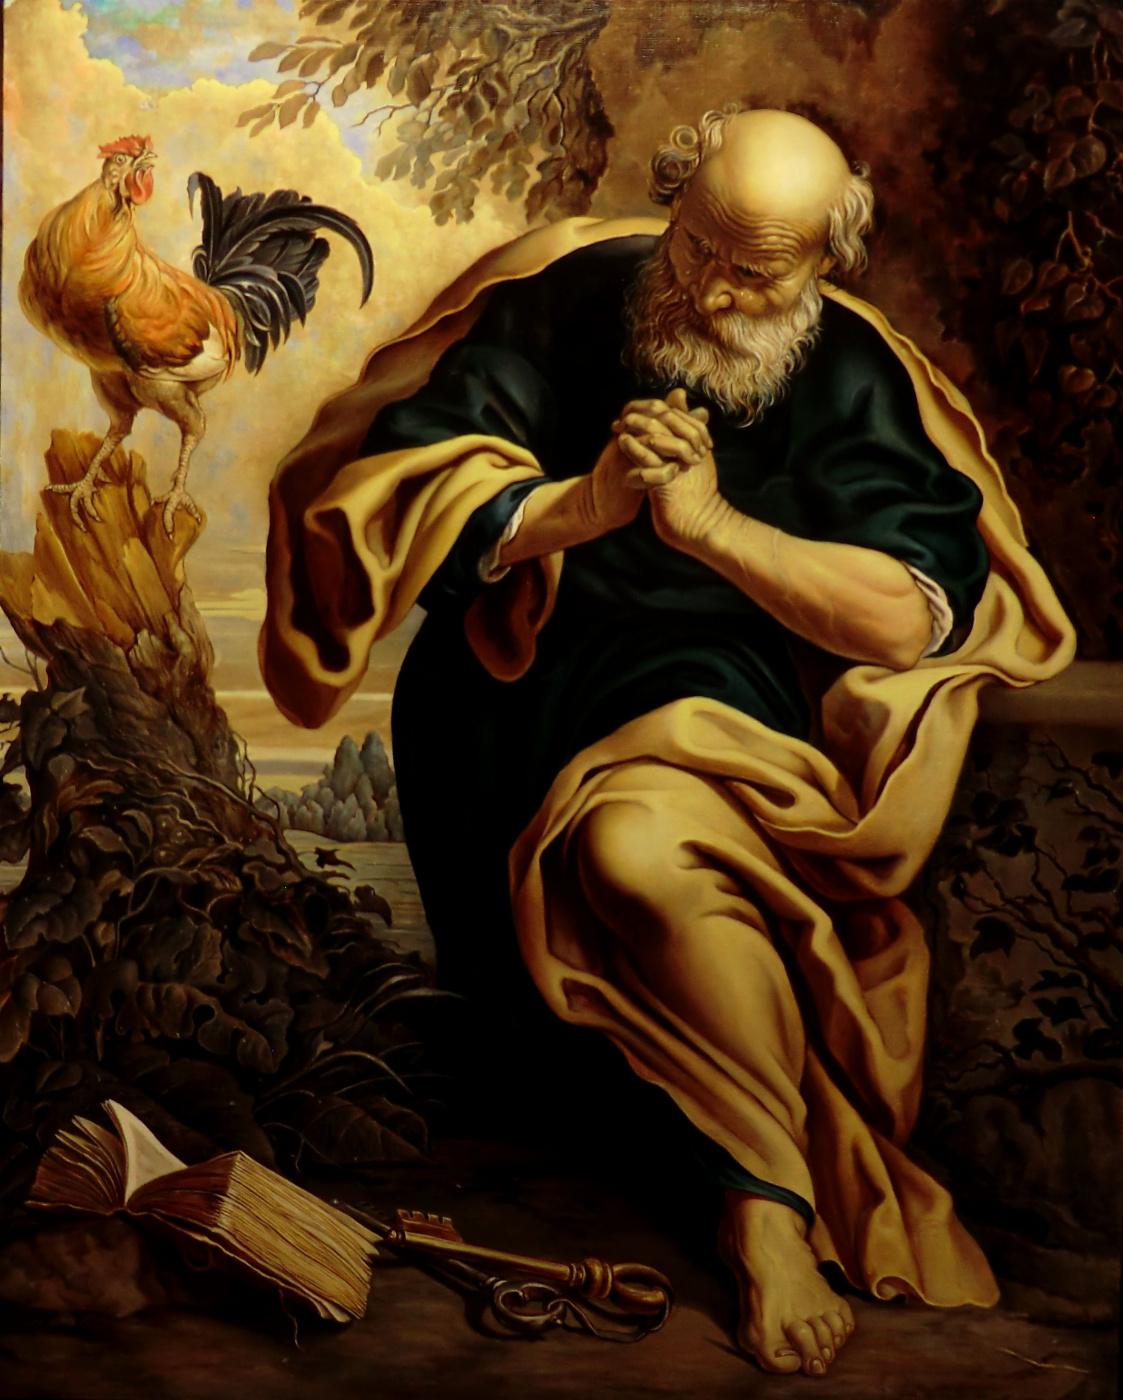 Valery Vasilyevich Litvinov. Repentance of St. Peter (copy of the Segers)